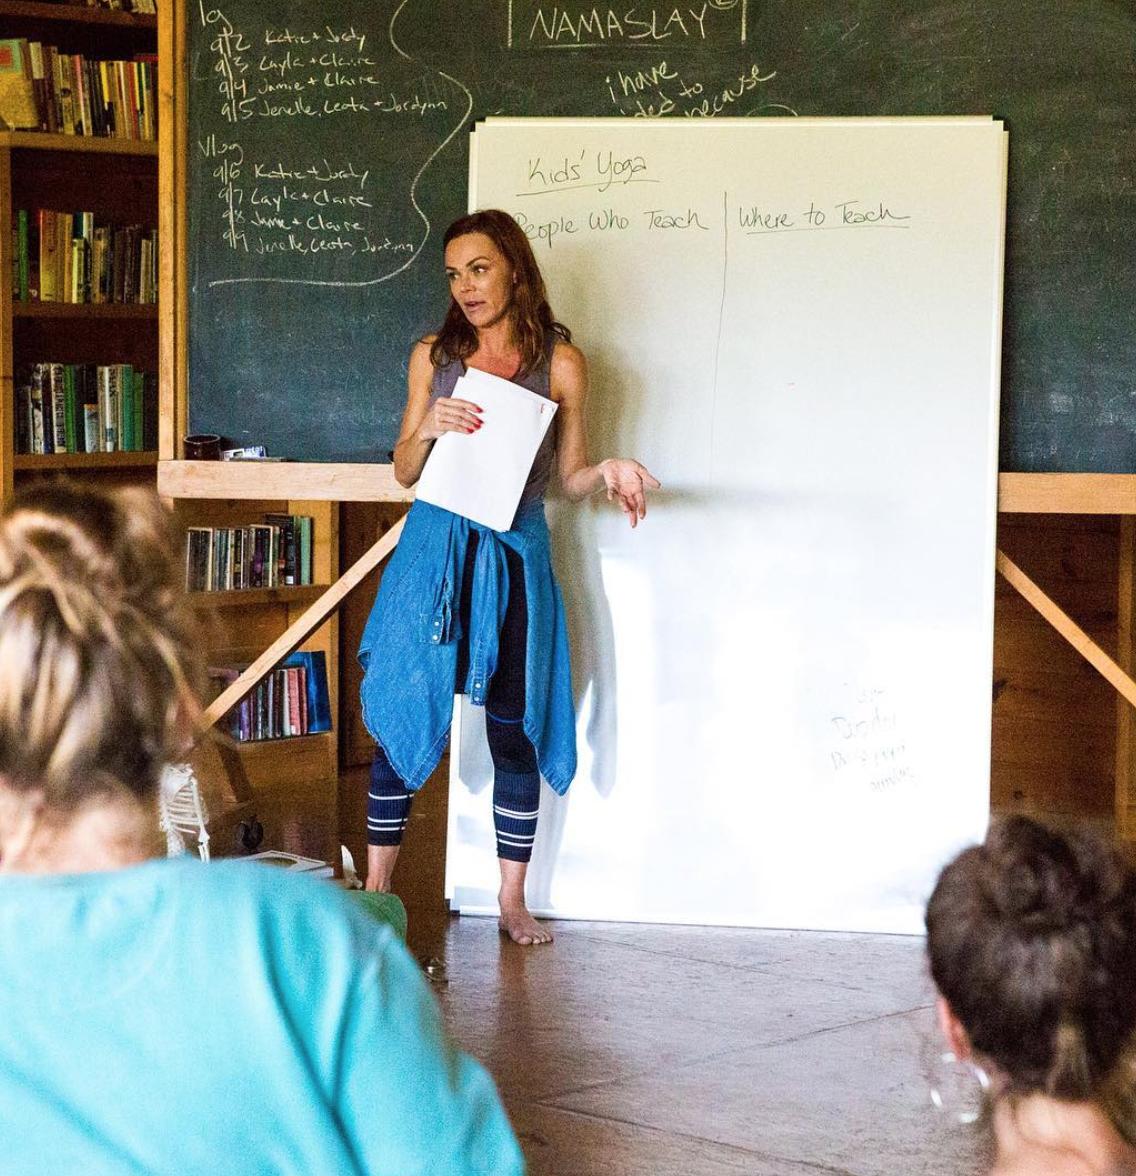 Dana teaching Yoga for Kids